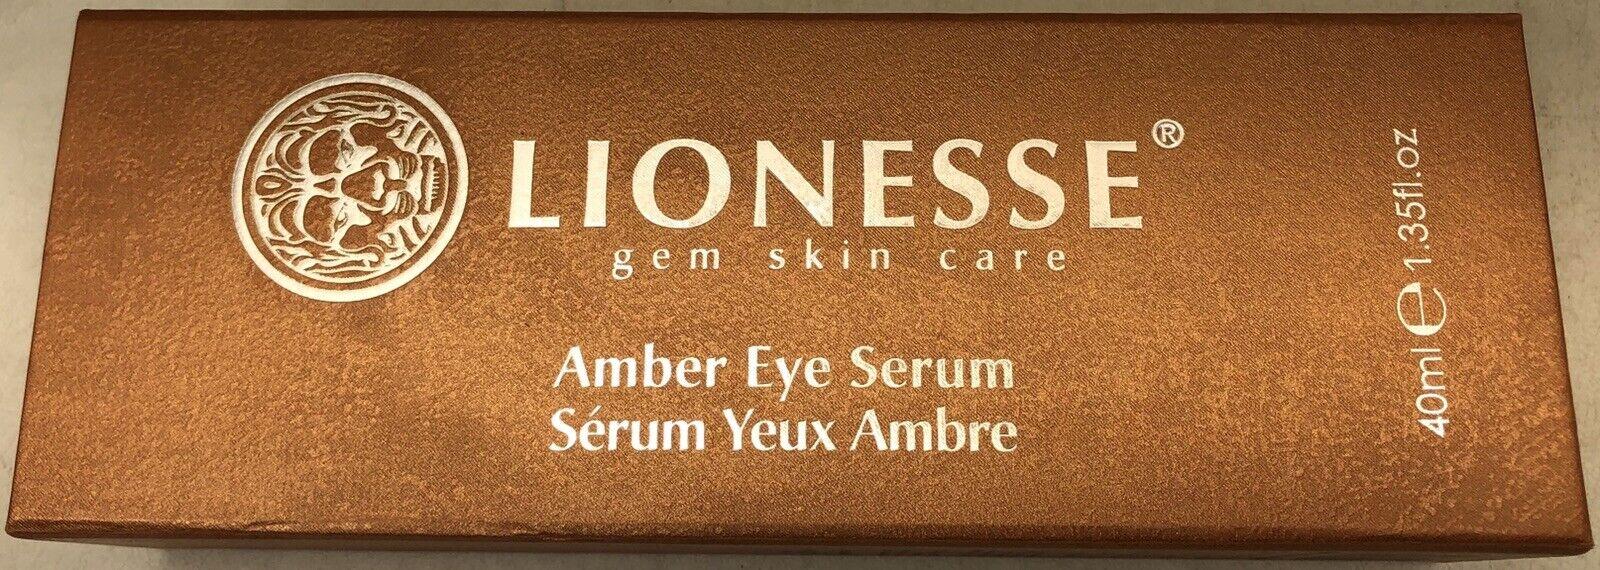 Lionesse Gem Skin Care Amber Eye Serum 40ml 1 35fl Oz For Sale Online Ebay